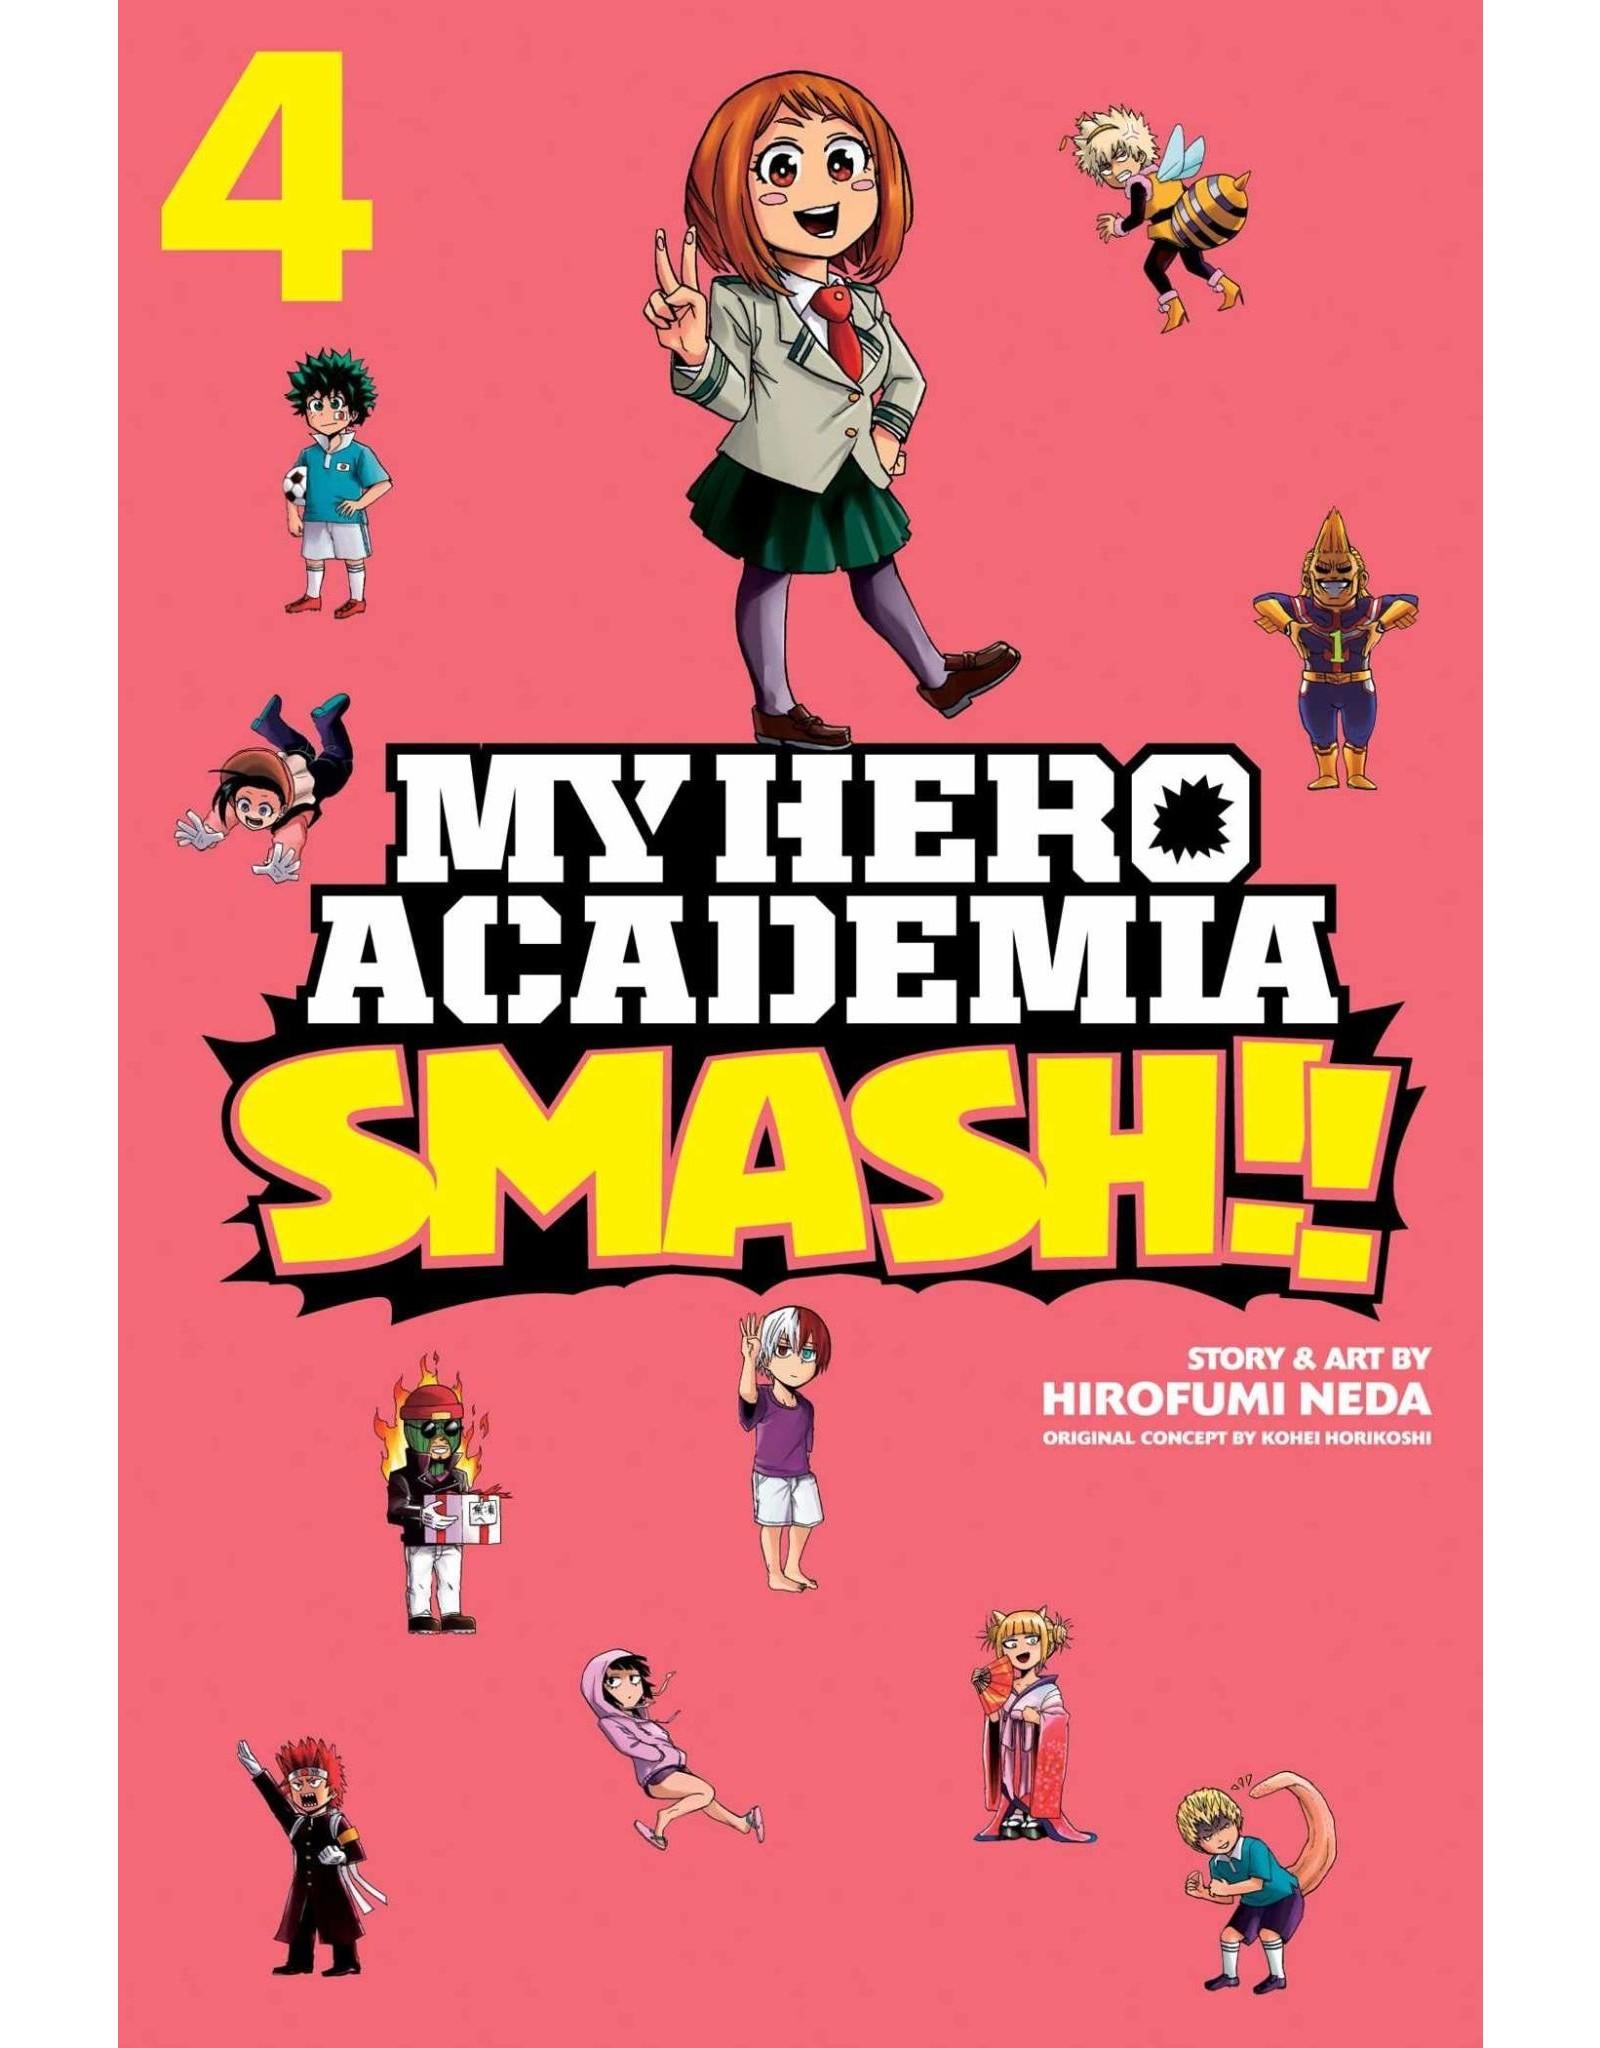 My Hero Academia Smash!! Volume 04 (Engelstalig)